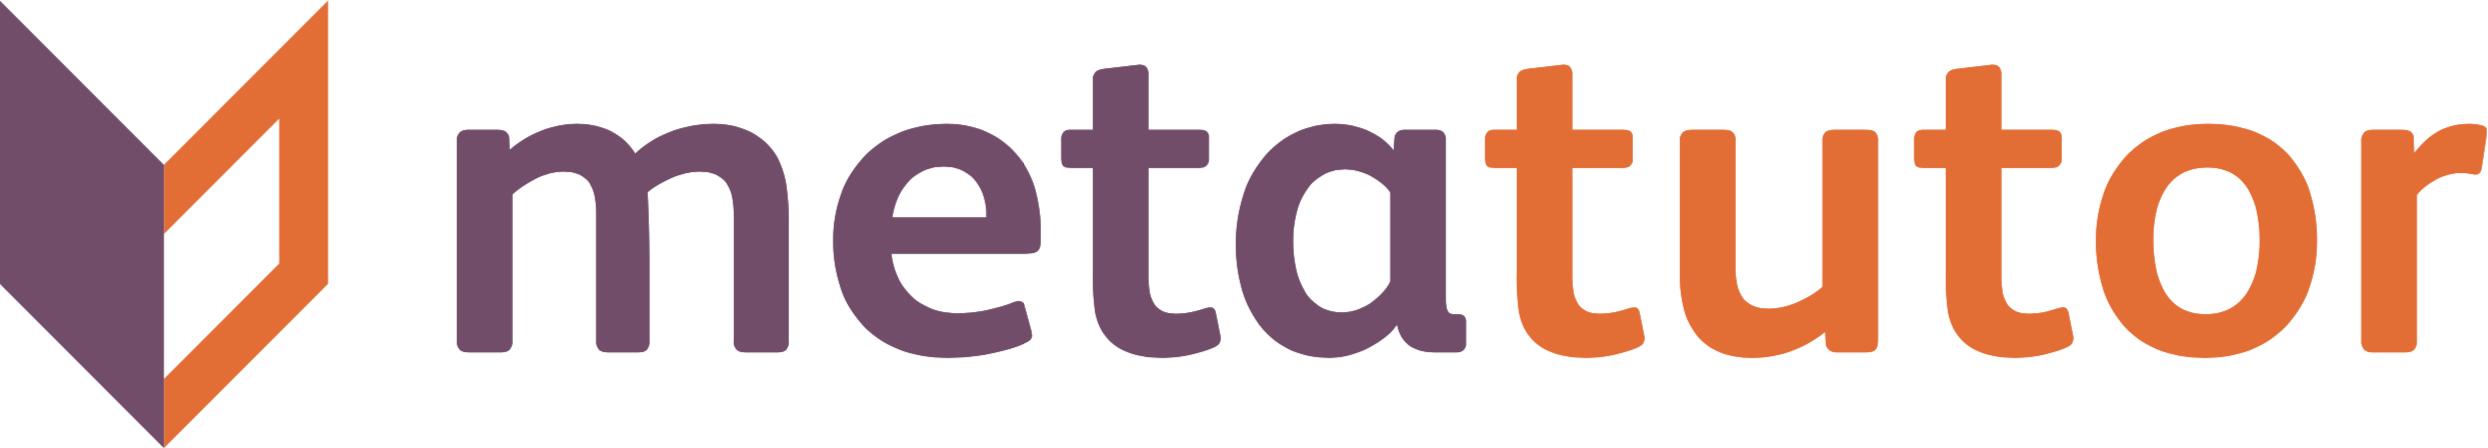 Metatutor